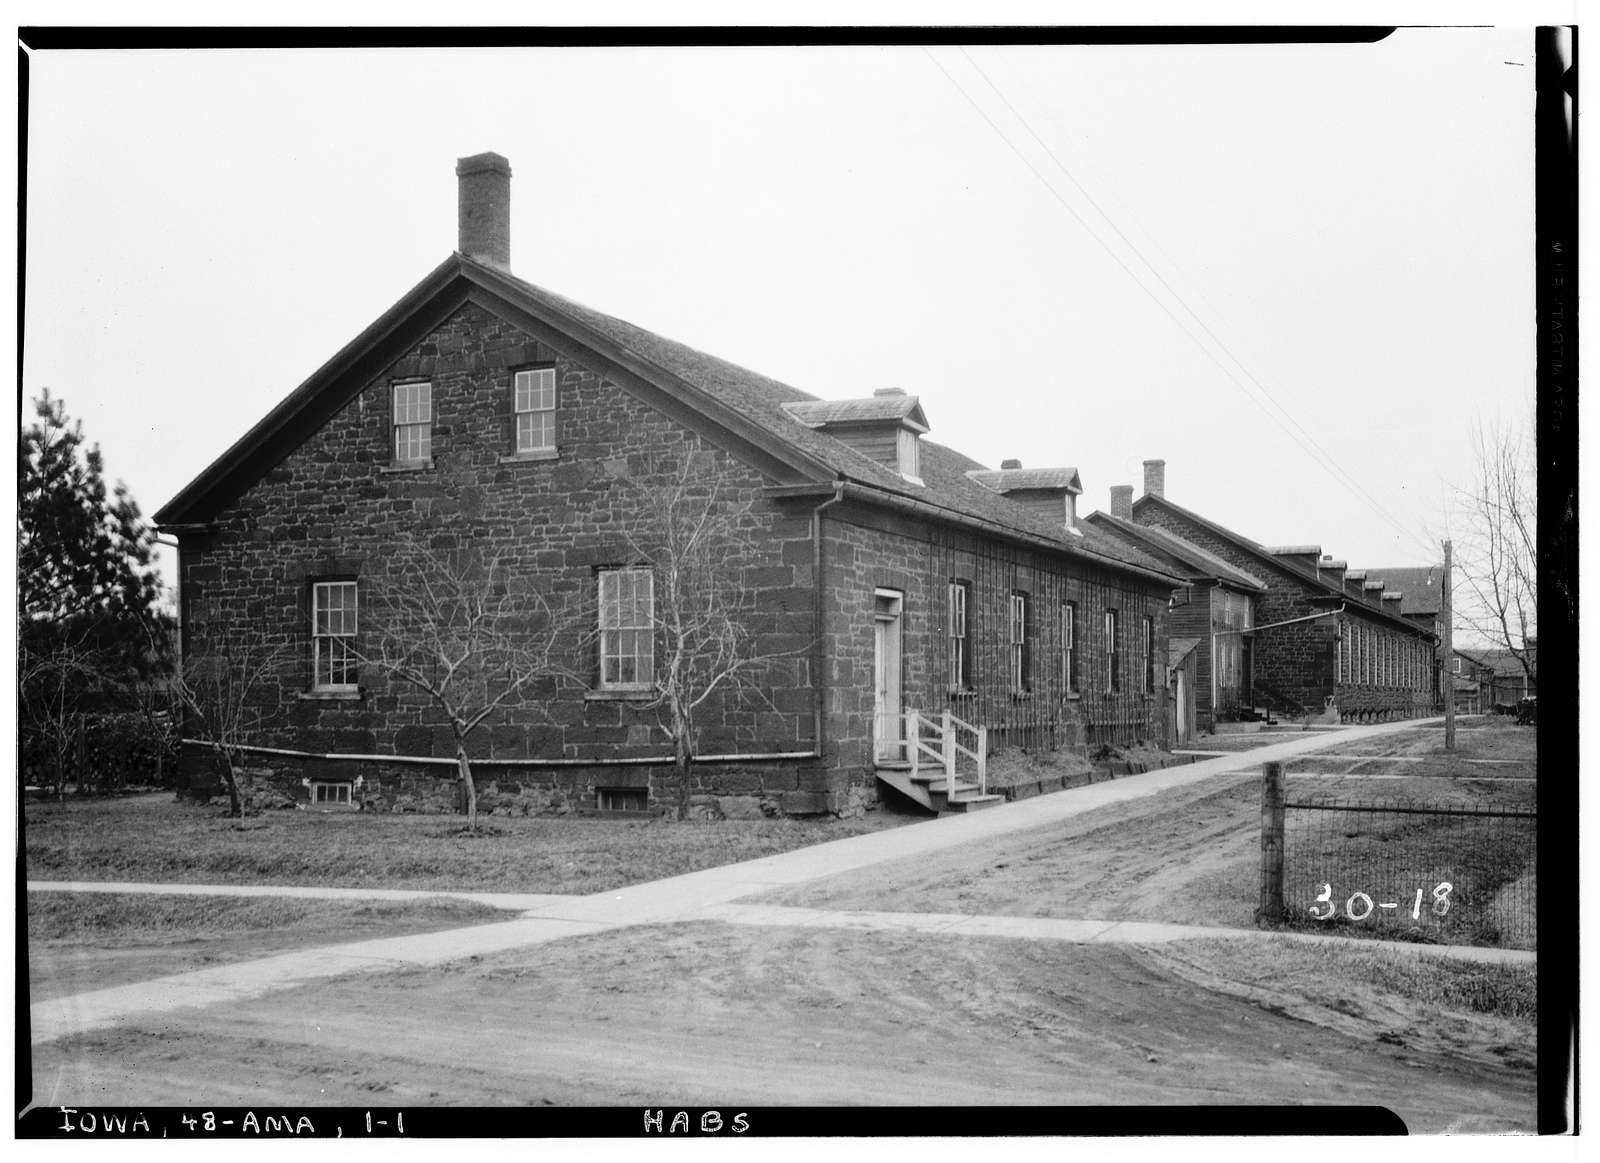 Lauer Meetinghouse, State Route 220 Vicinity, Amana, Iowa County, IA